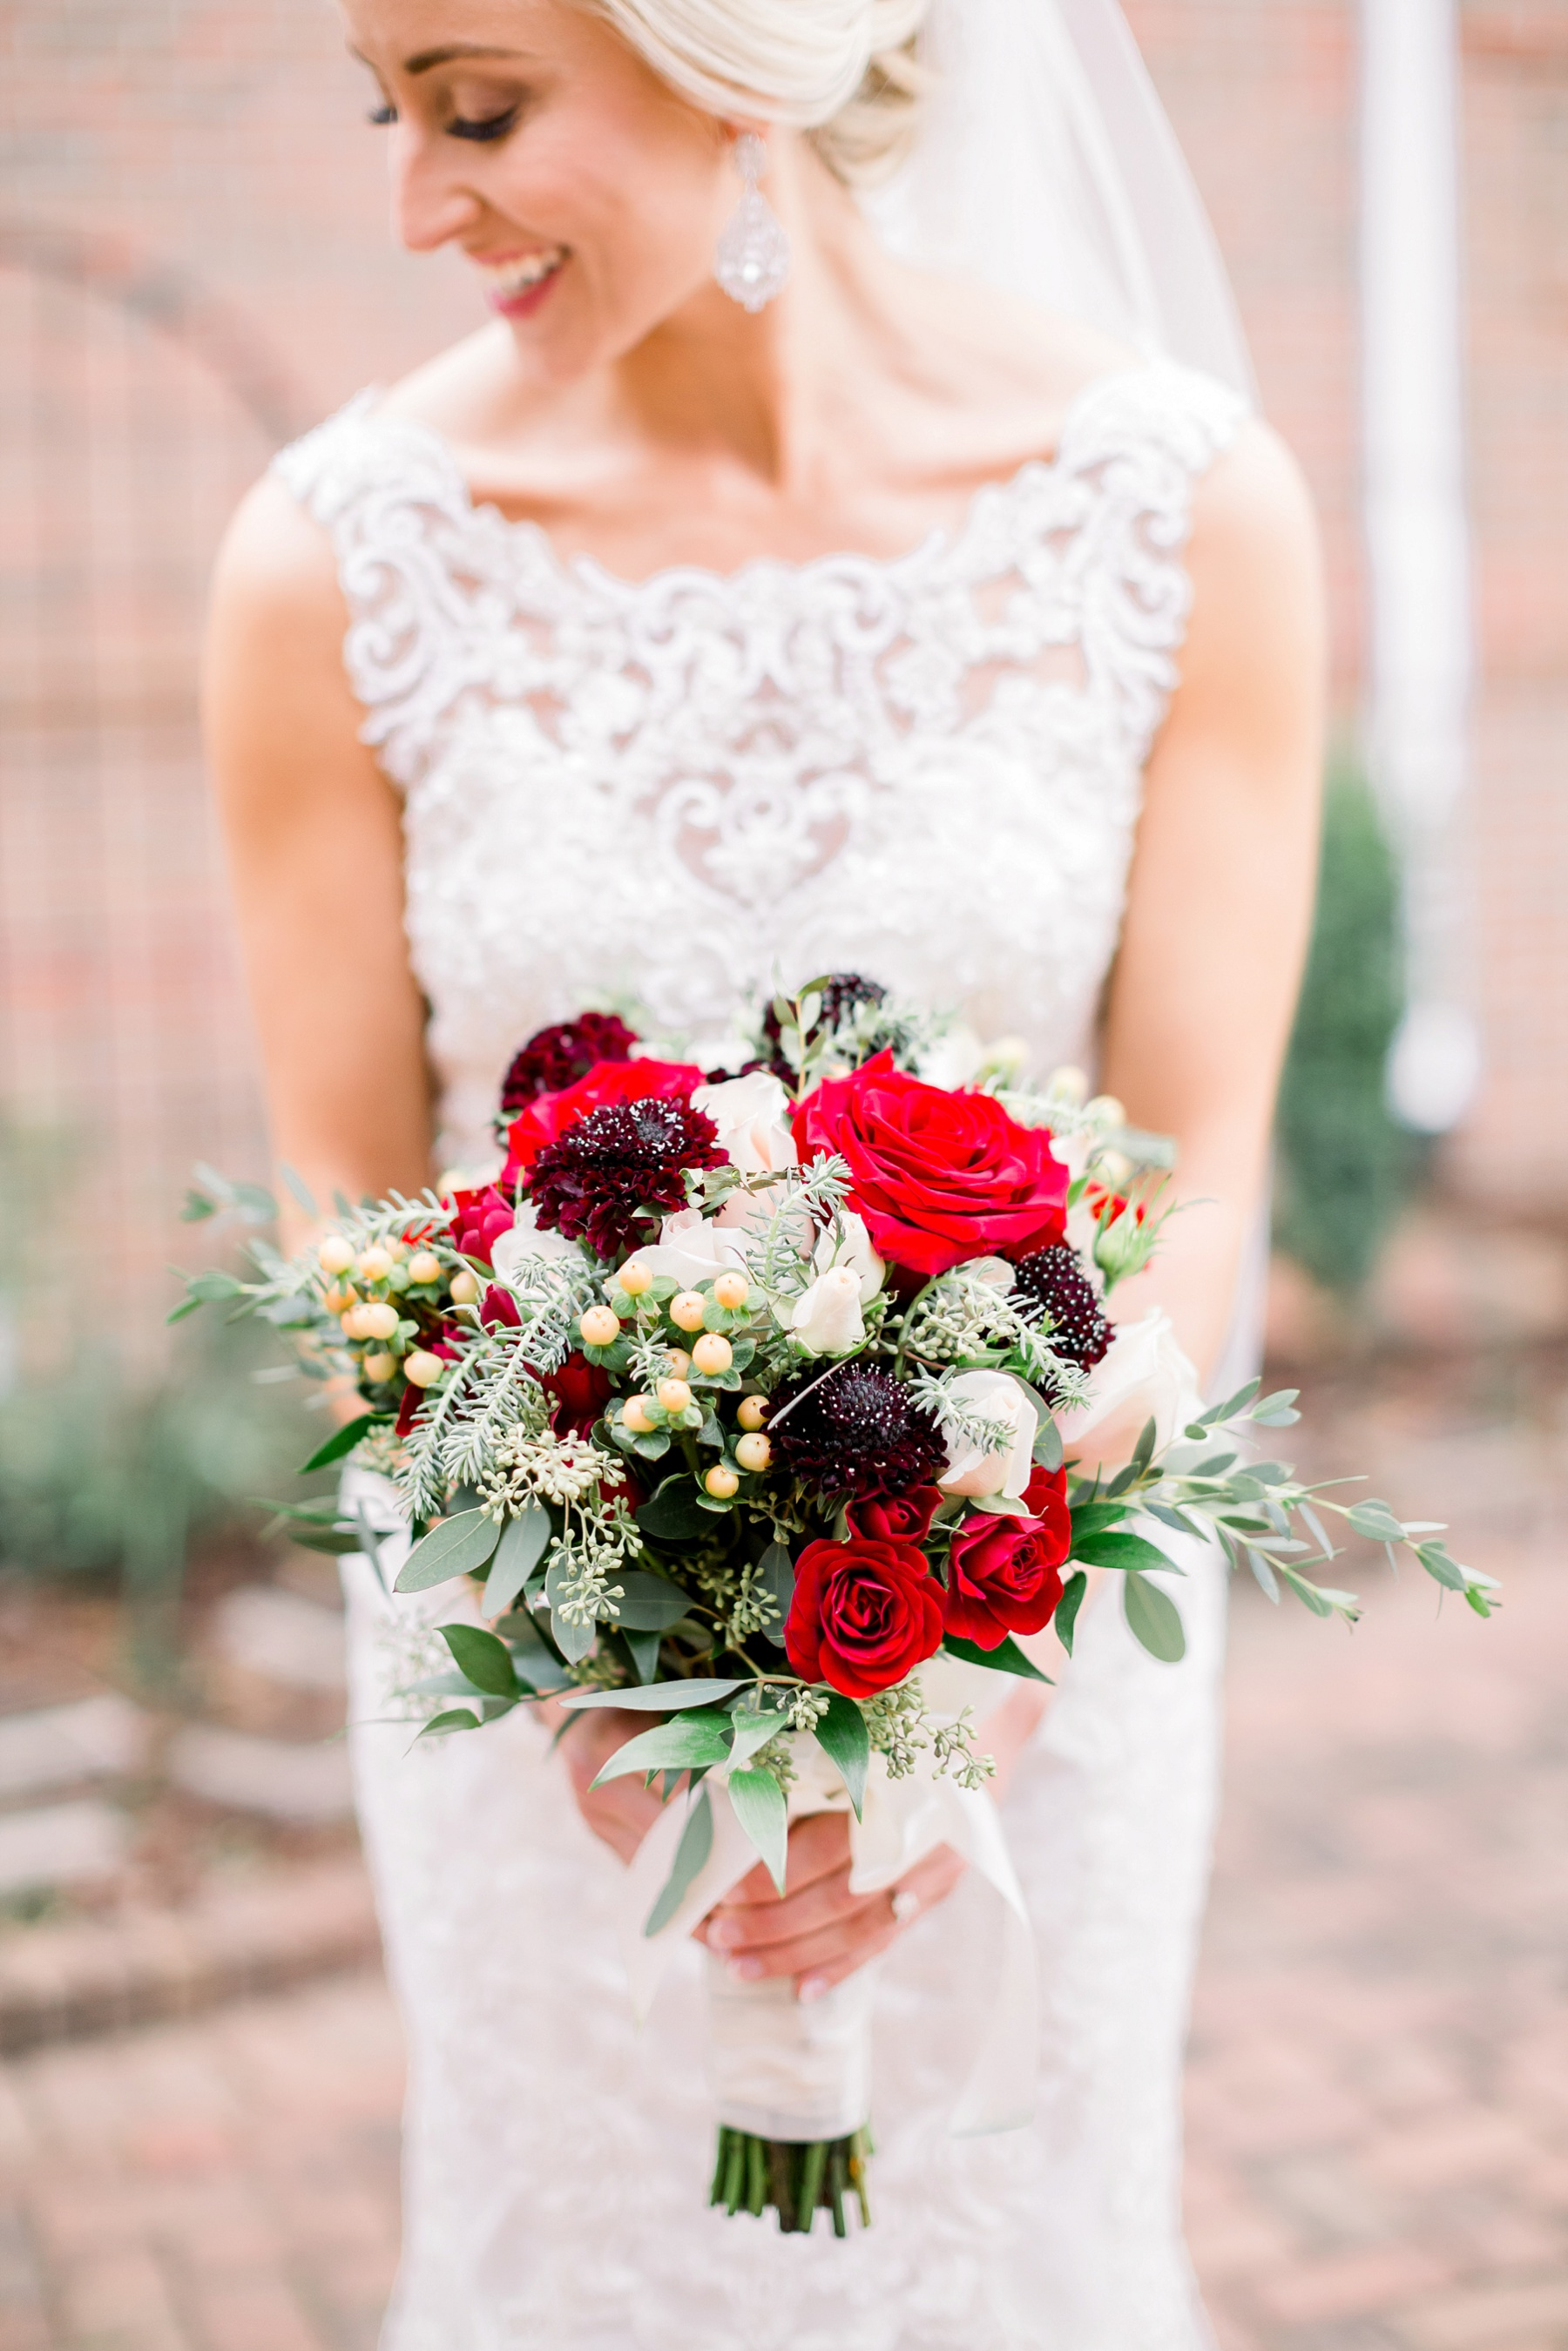 midwest-adventurous-wedding-photographer-elizabeth-ladean-photography-photo_4726.jpg